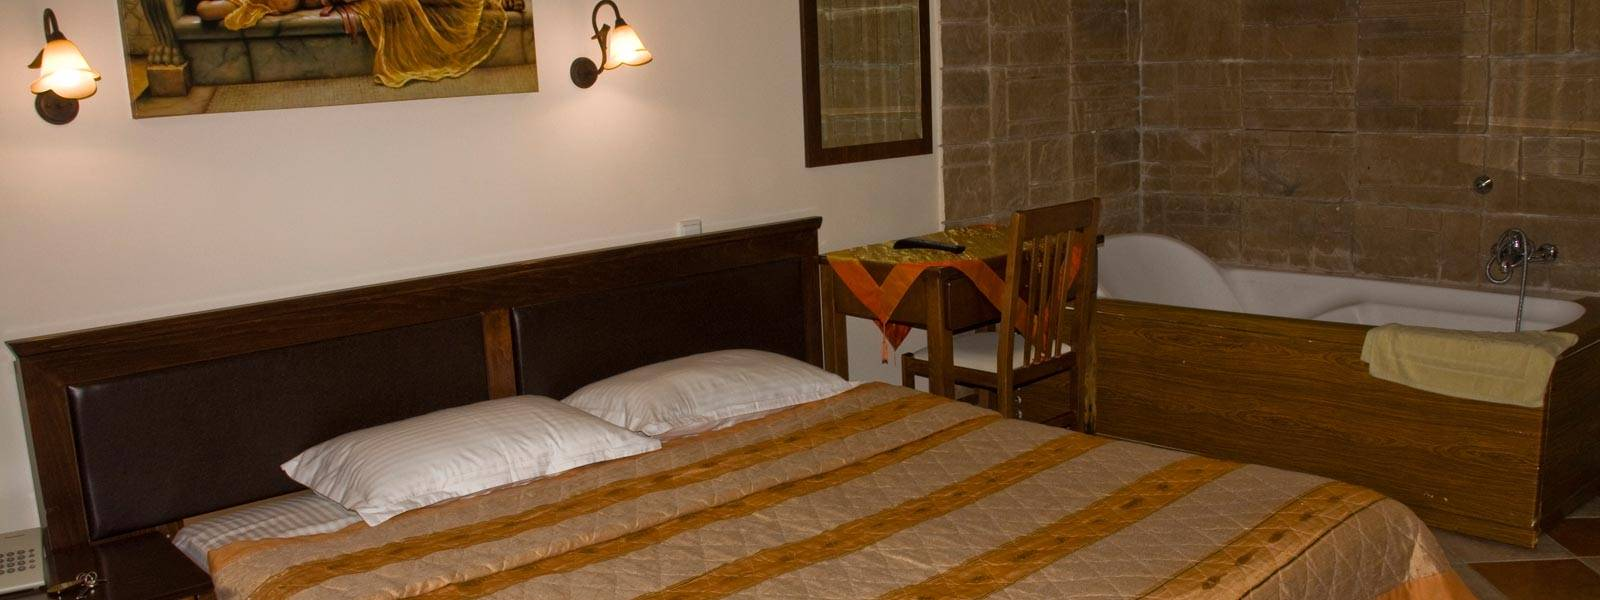 studio u0026 jacuzzi u0026 fireplace guesthouse kallinikos pozar cheap